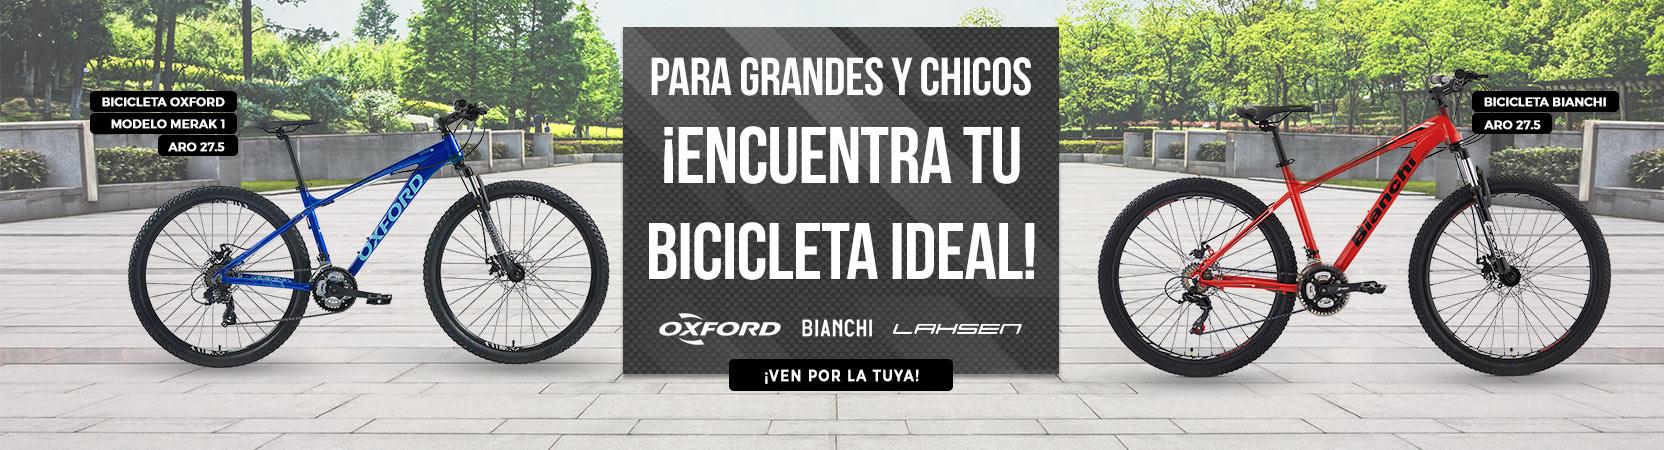 Para grandes y chicos | ¡Encuentra tu Bici ideal! | Logo Marcas: Oxford - Bianchi - Lahsen